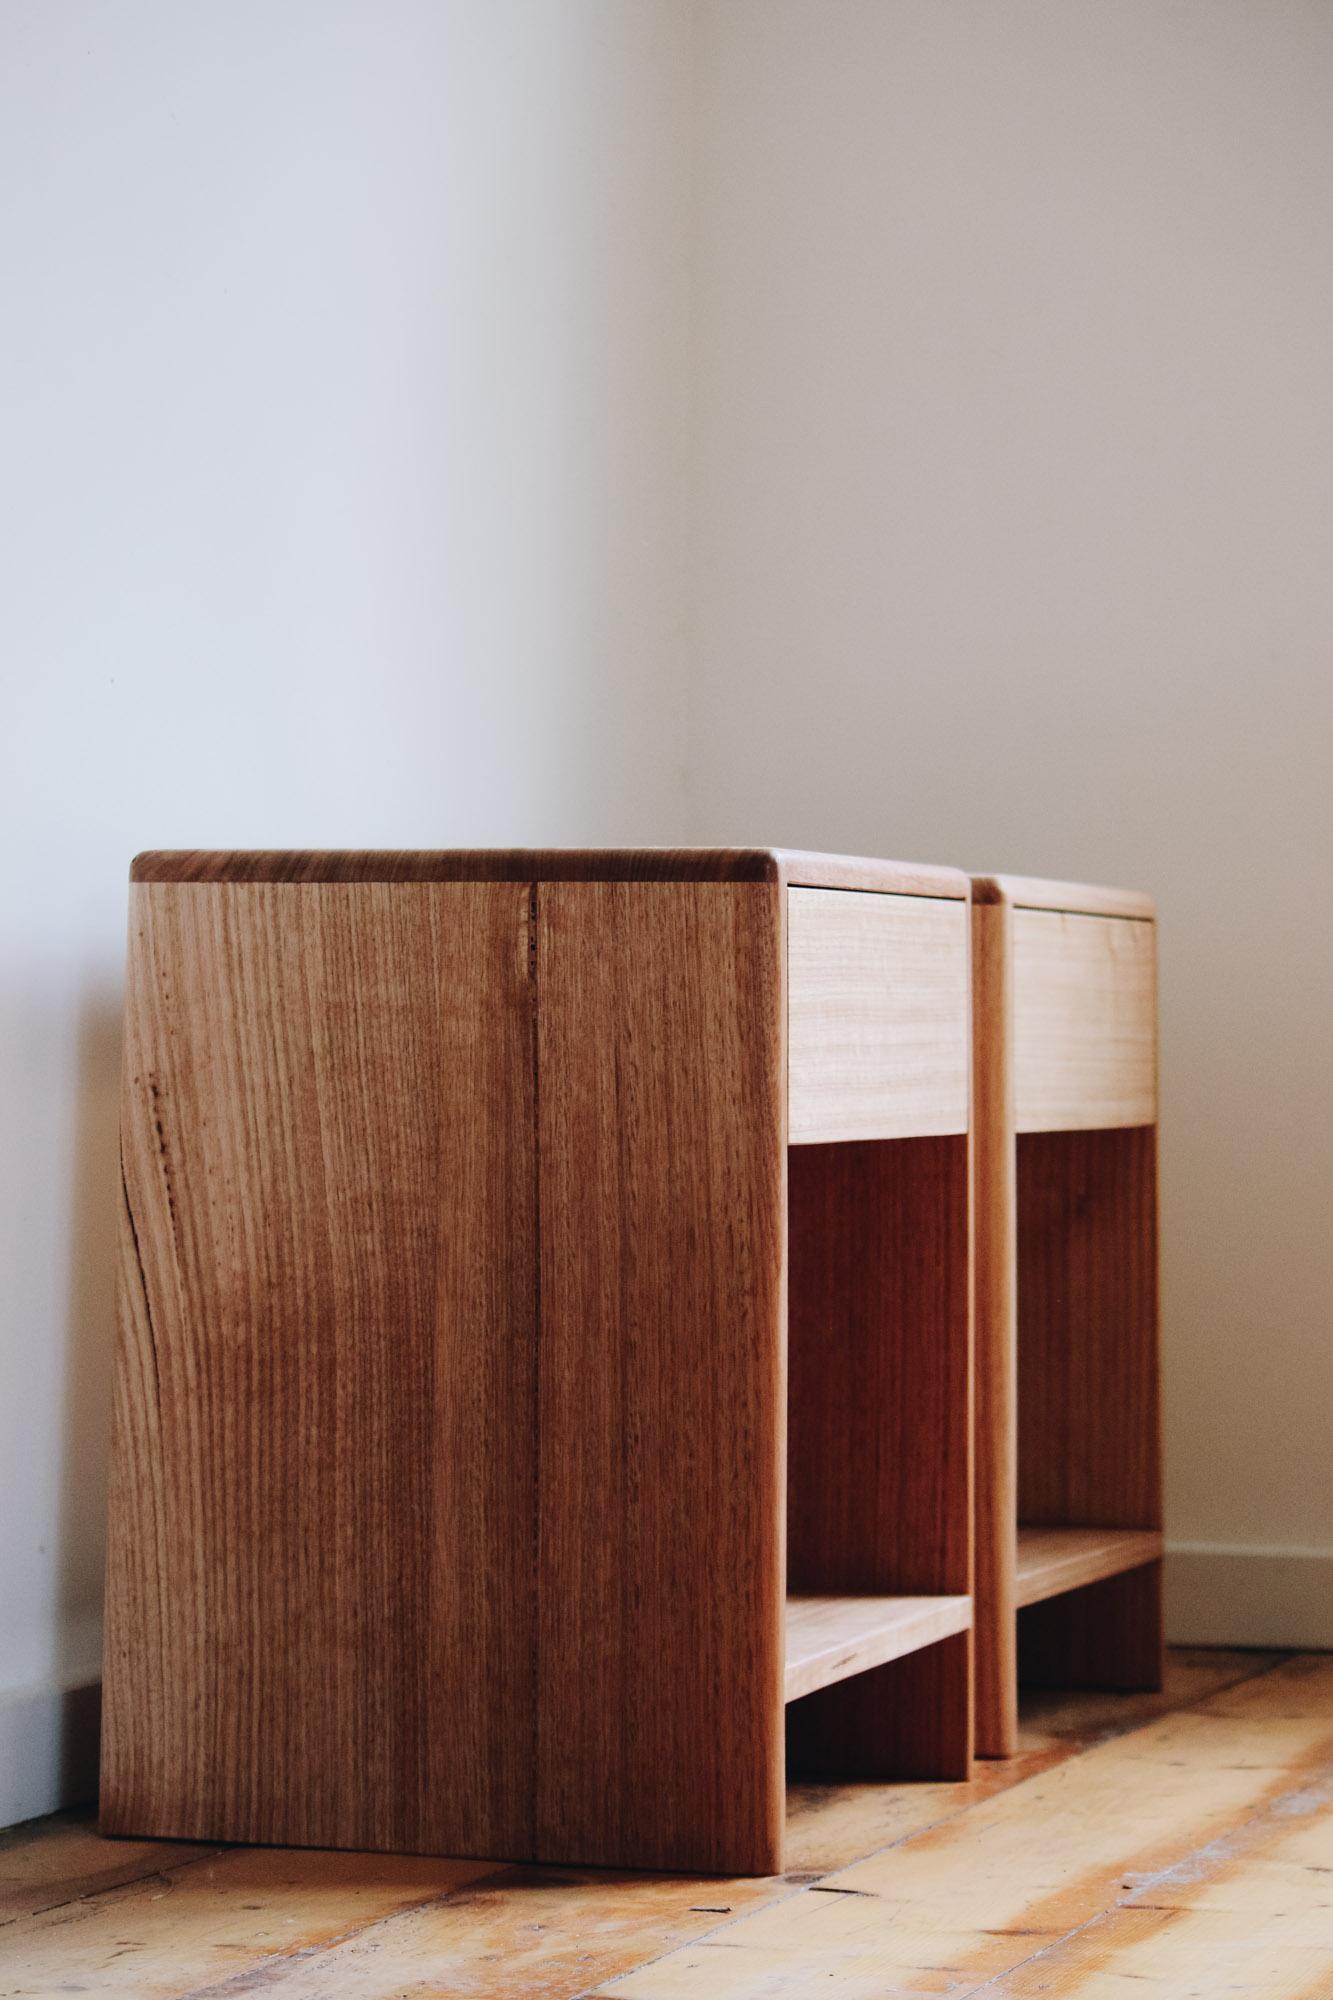 Al and Imo Handmade - Low Bedside Tables - Custom minimalst timber side drawer - Melbourne - Surf Coast - Australia-2.jpg